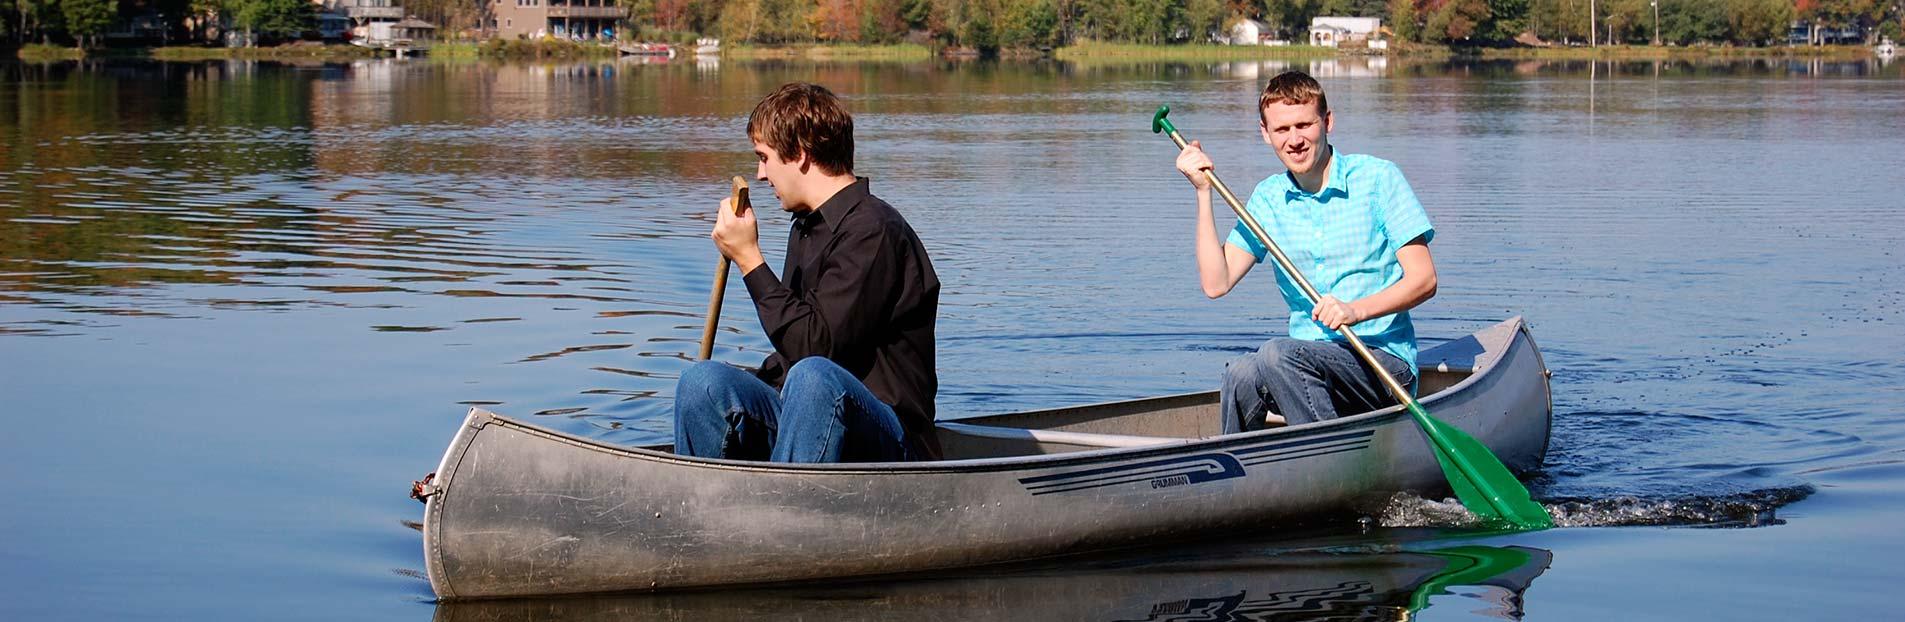 WATER FUN - Pocono Lifestyle